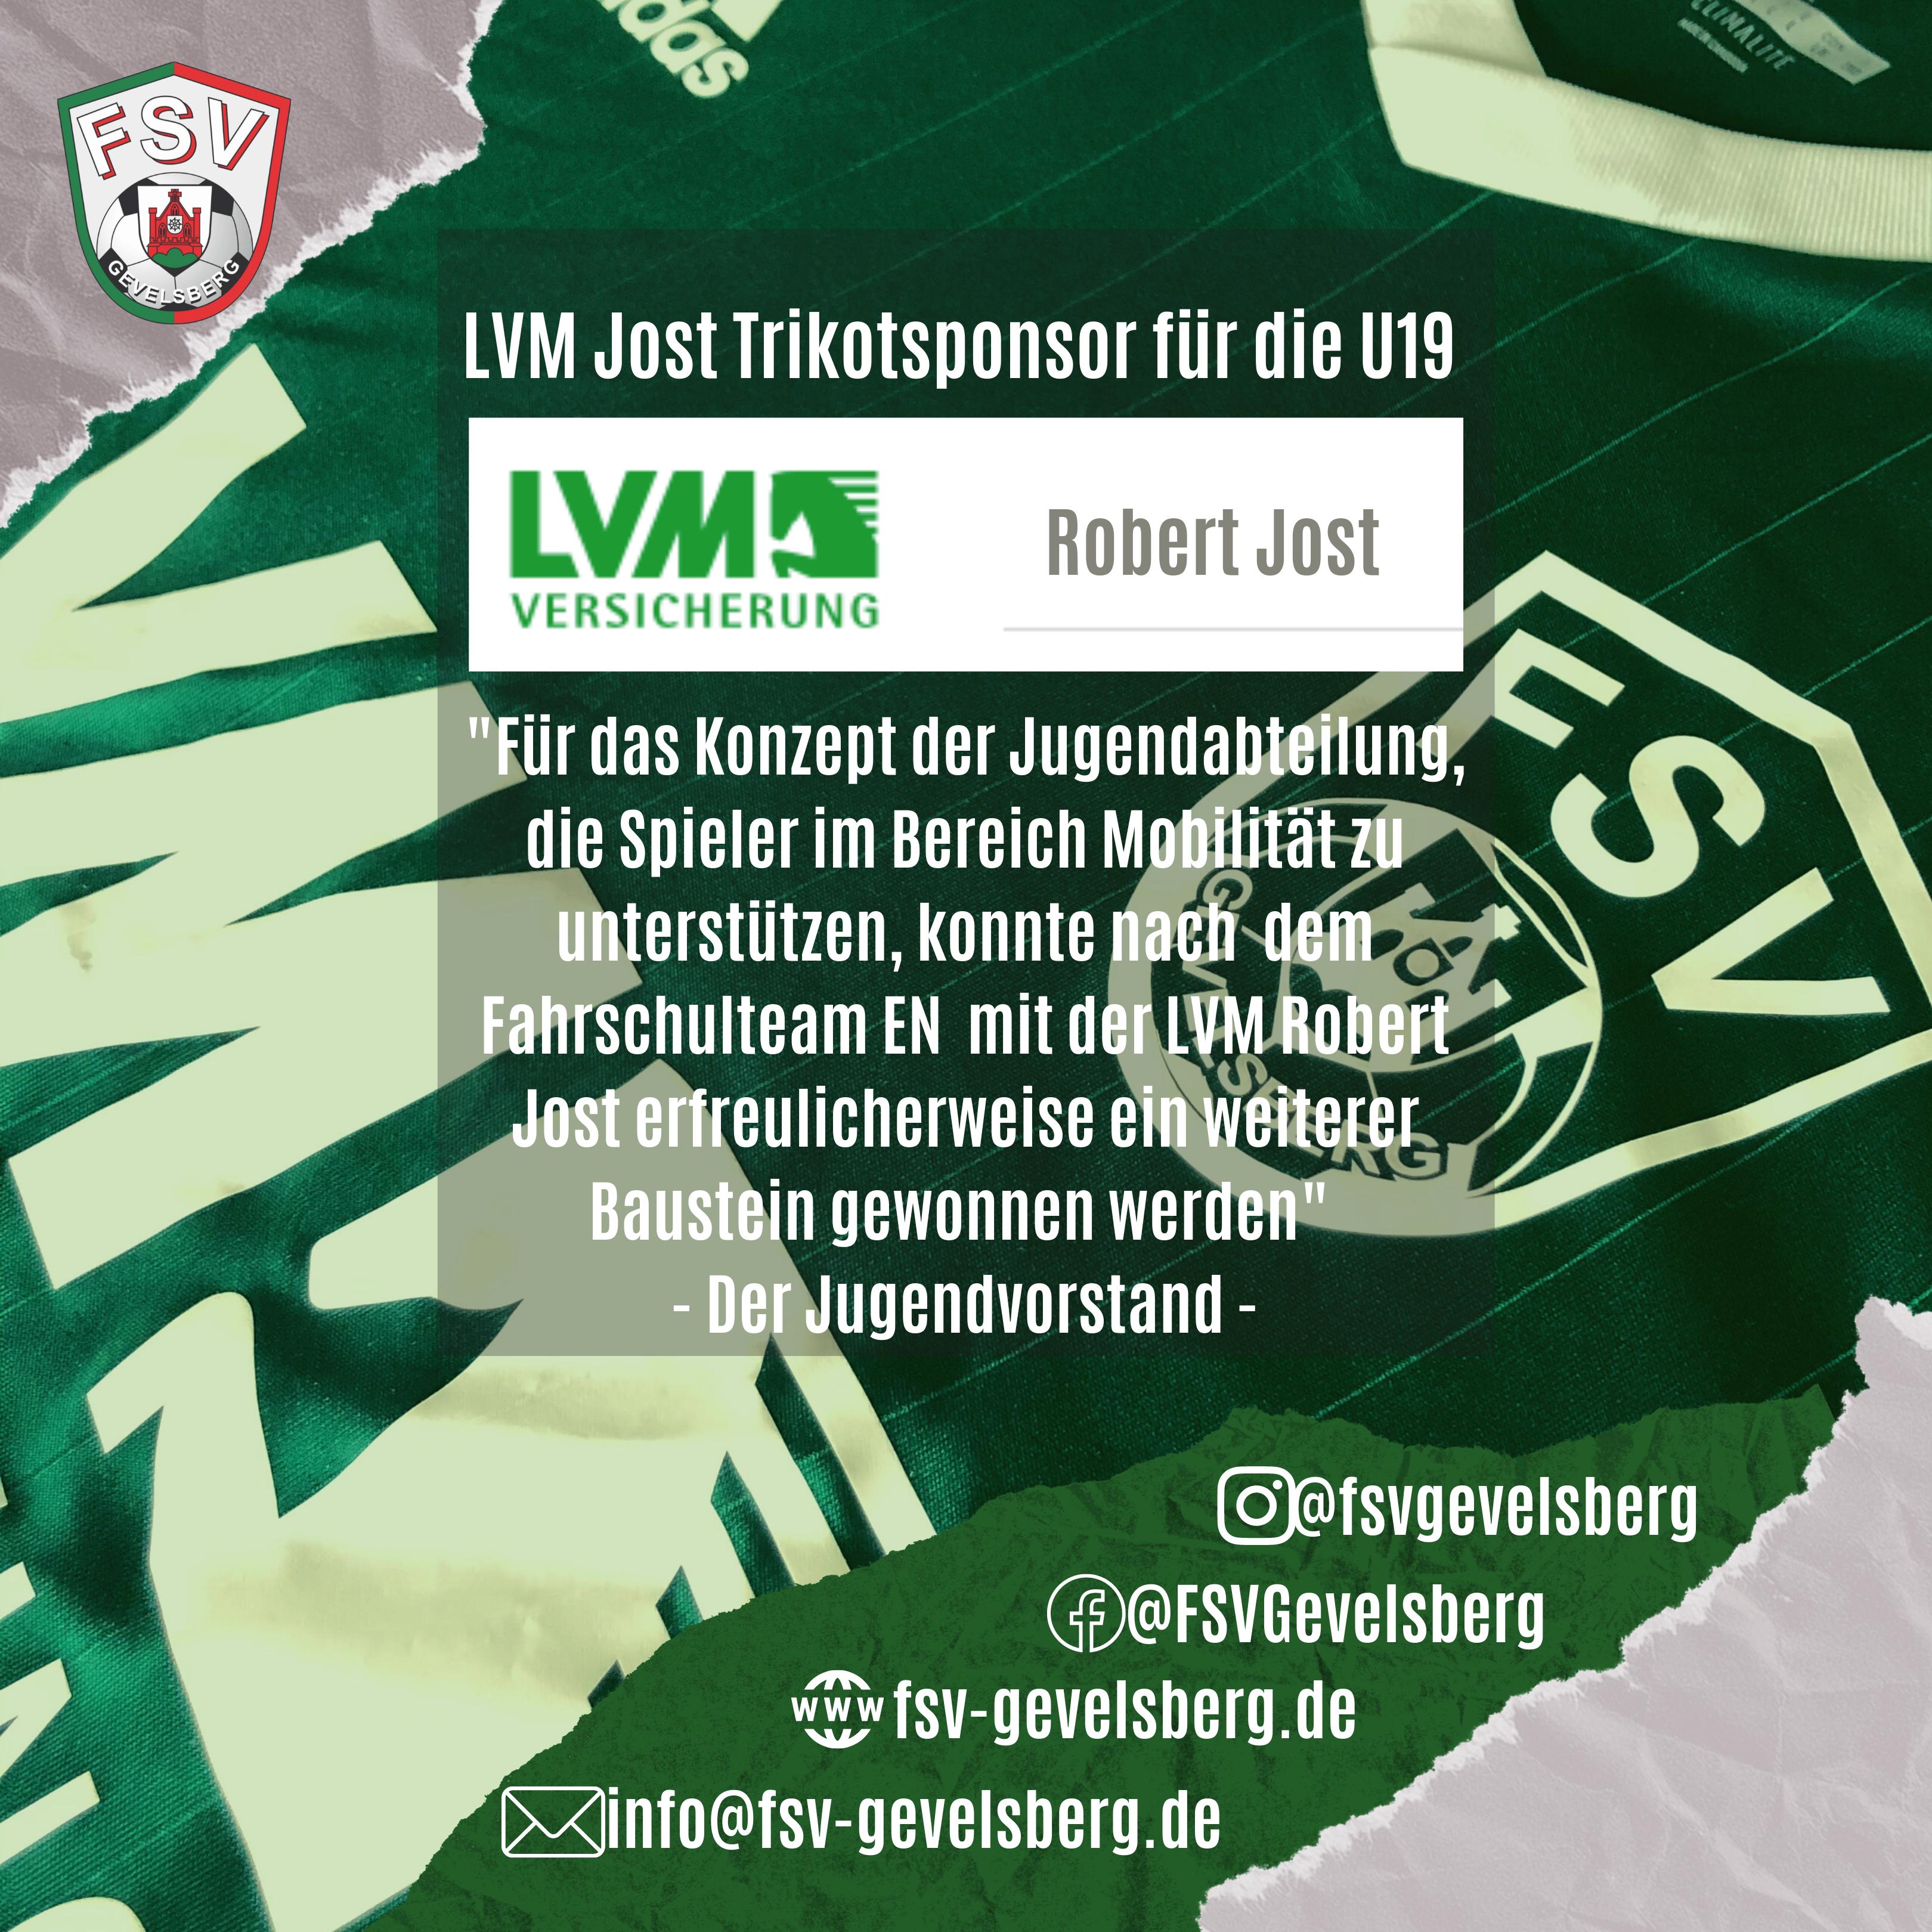 LVM Jost Trikotsponsor für die U19